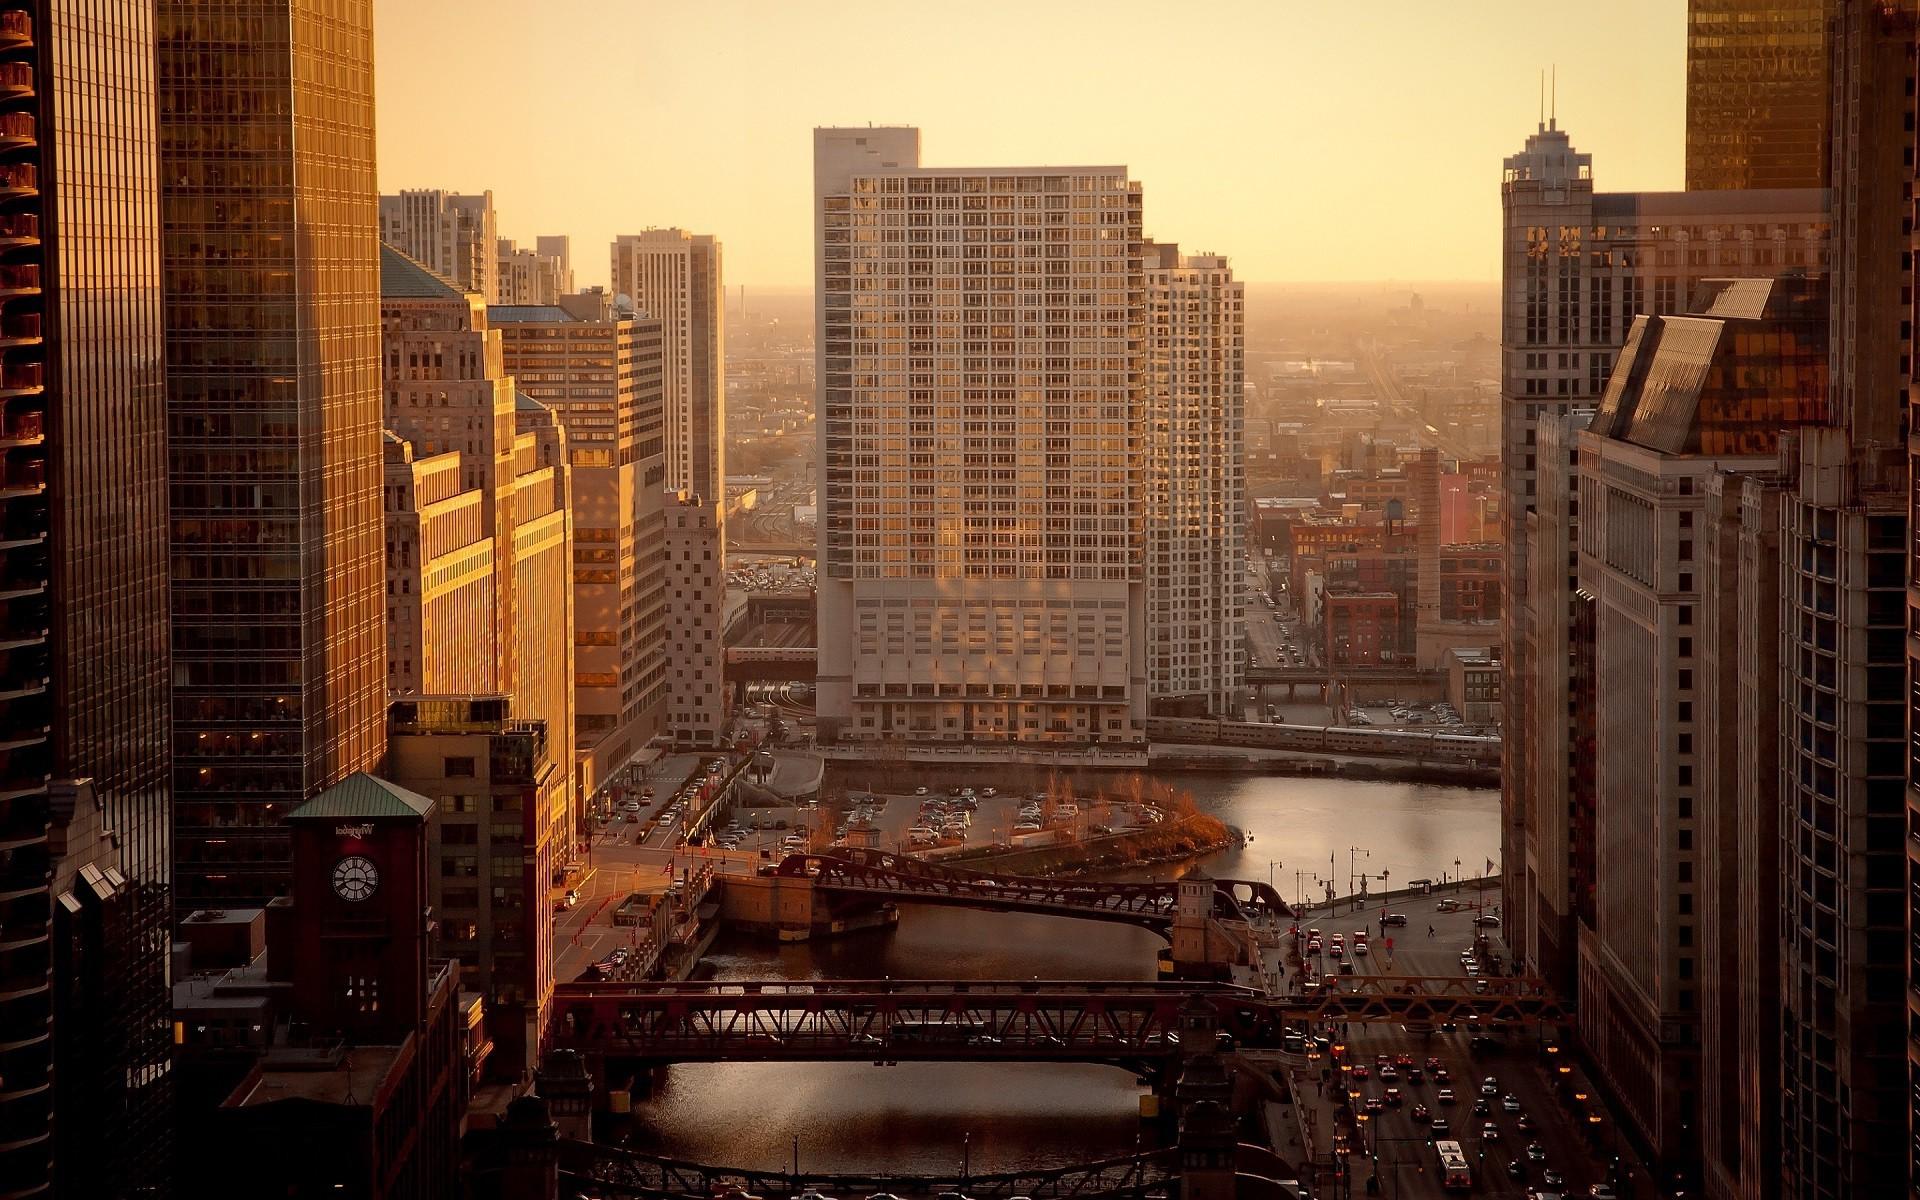 City Street Cityscape Night Car Building Road Sunrise Skyline Skyscraper Evening Morning Bridge River USA Chicago